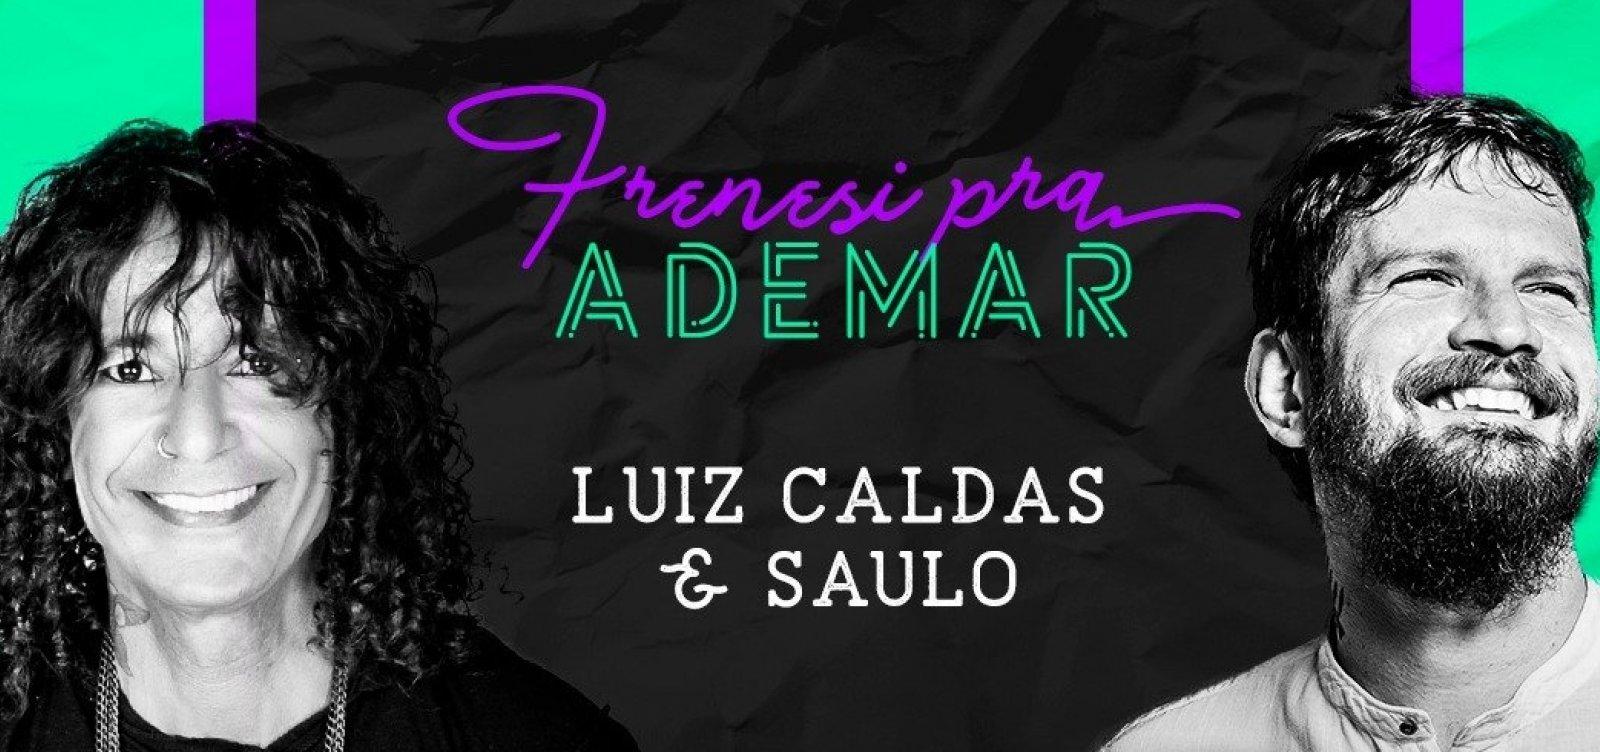 Show 'Frenesi para Ademar' será transmitido no YouTube